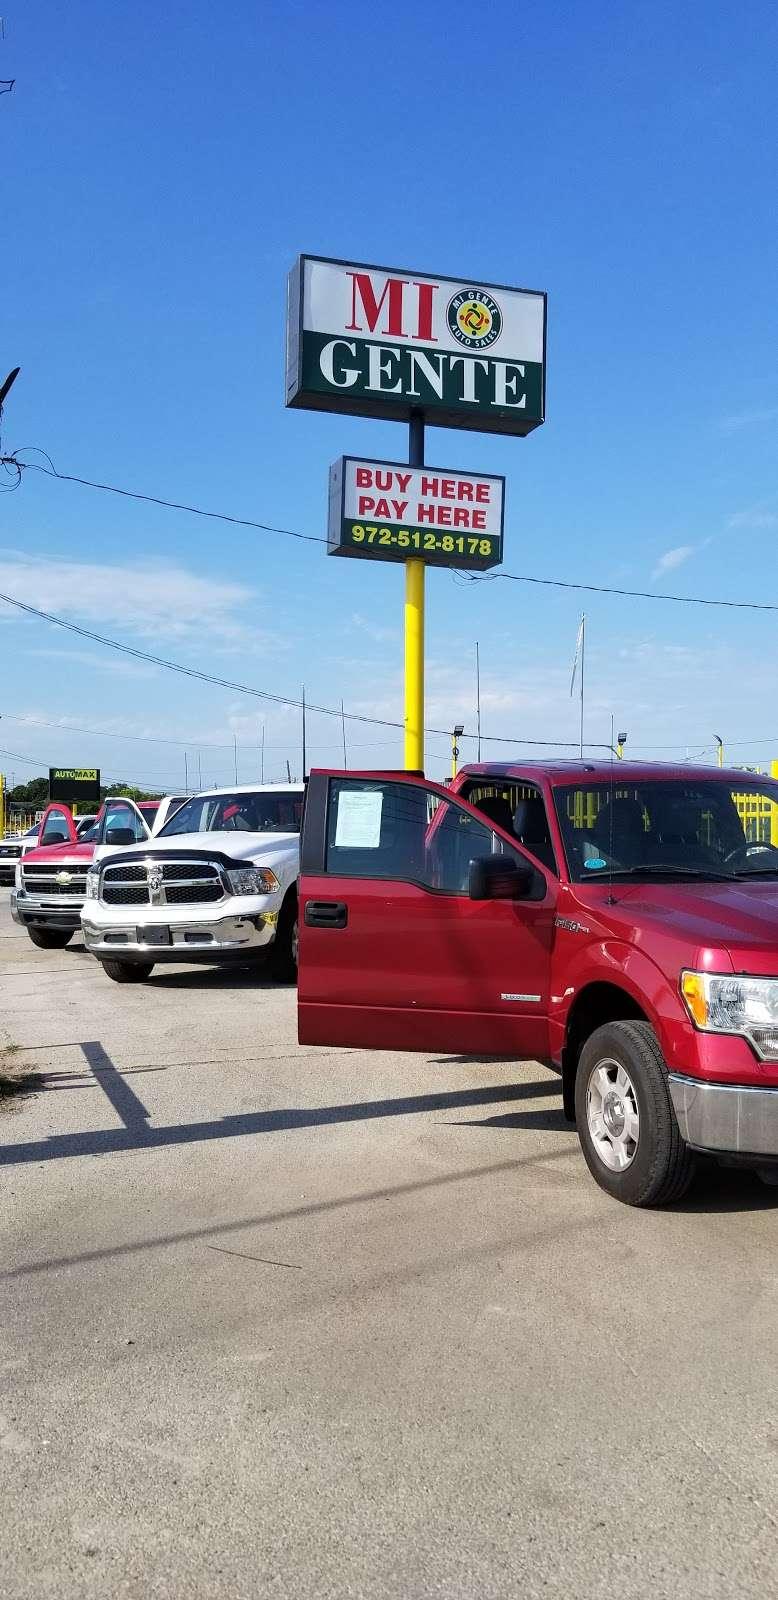 Mi Gente Dallas - car dealer  | Photo 10 of 10 | Address: 935 S Buckner Blvd, Dallas, TX 75217, USA | Phone: (972) 512-8178